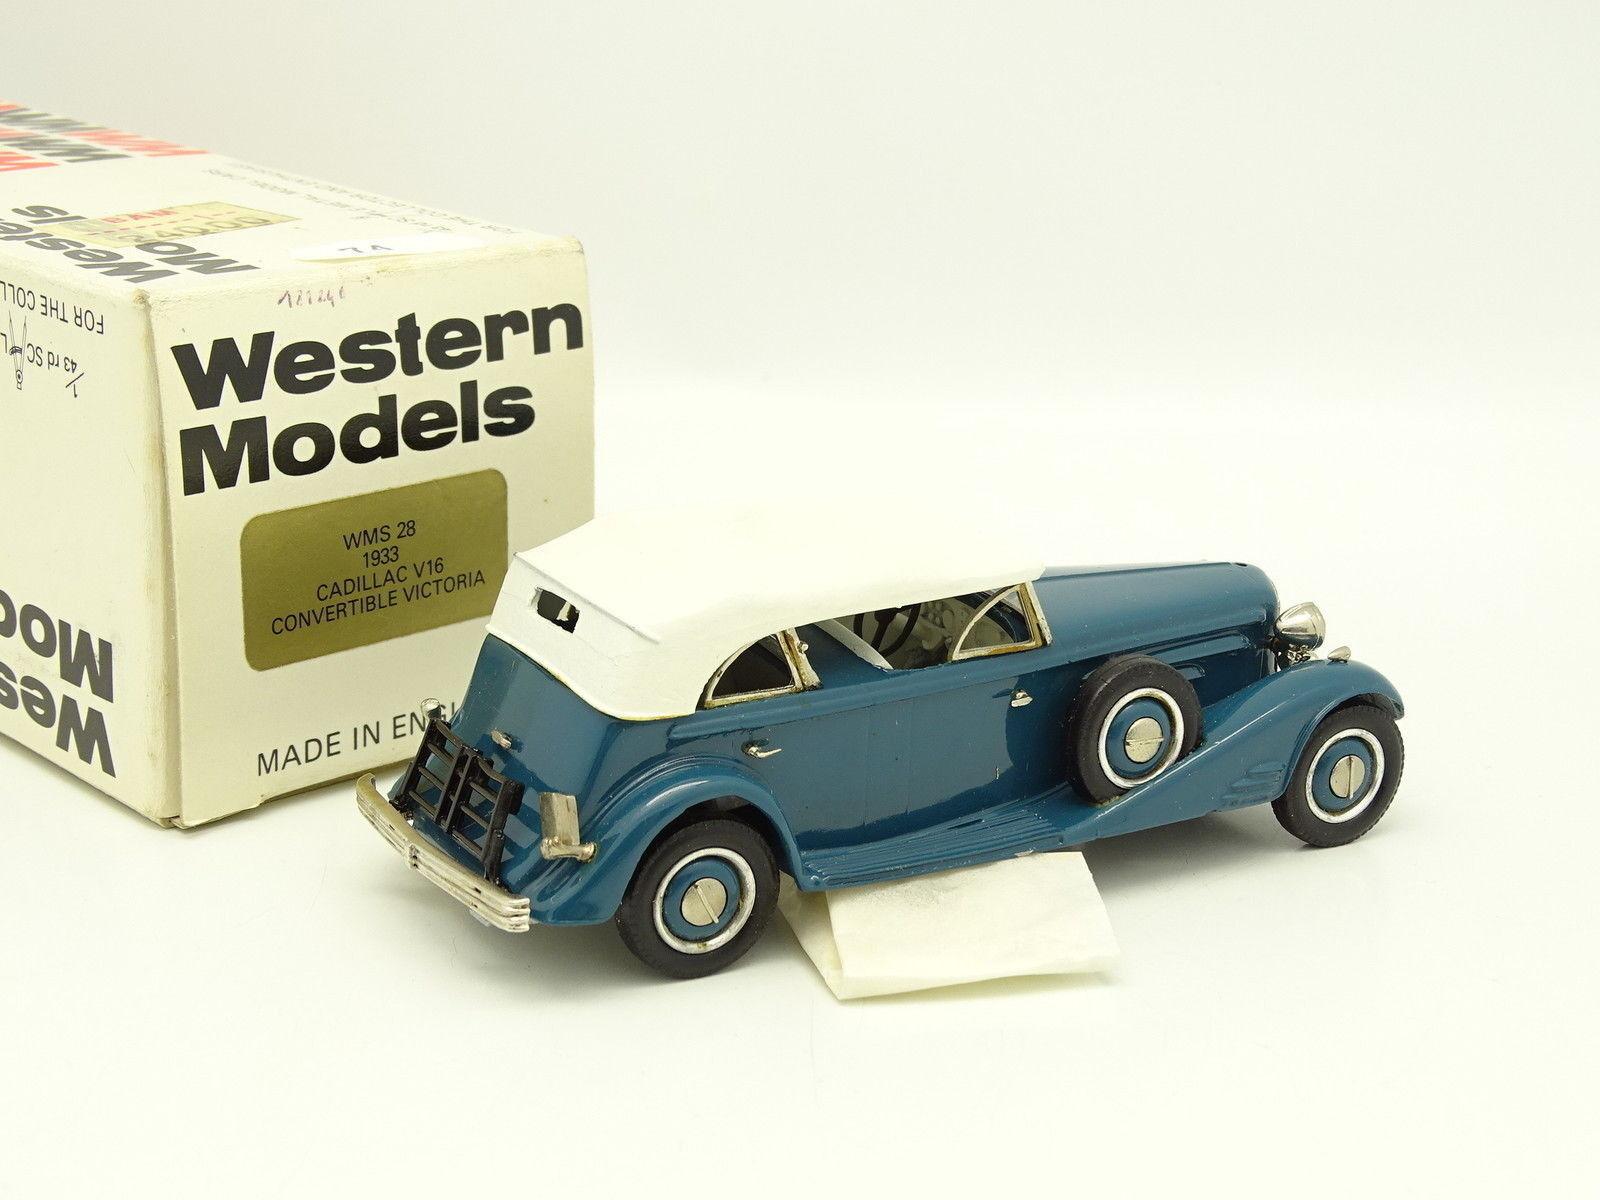 Western Models 1 43 - Cadillac V16 Victoria bluee 1933 1933 1933 1ce5f7